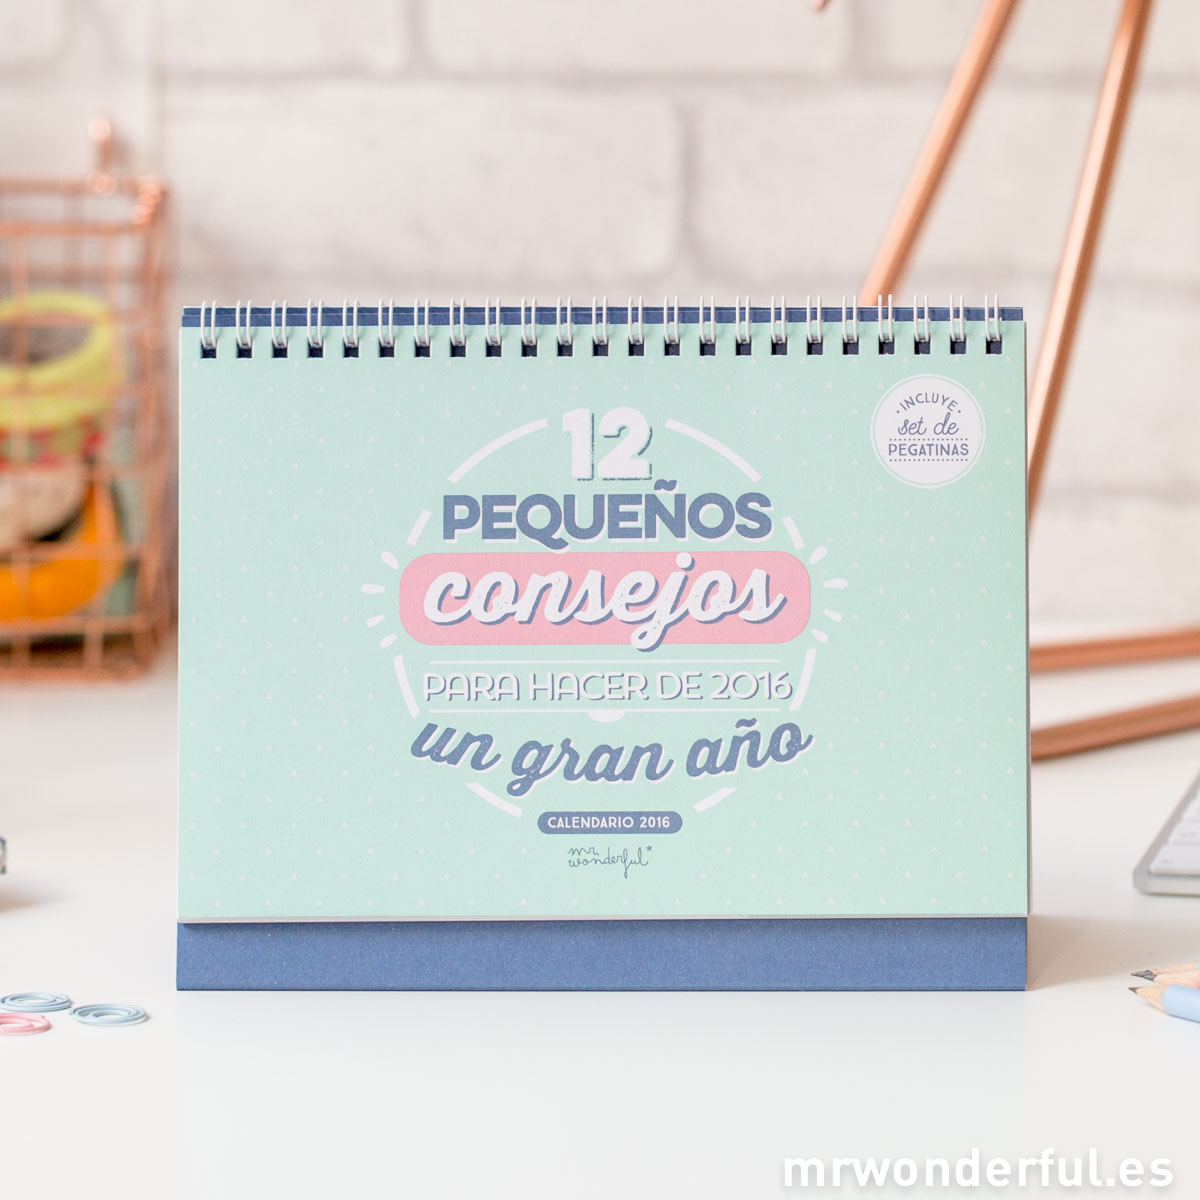 mrwonderful_WOA02926_8436547193615_Calendario-Trabajo-castellano-2015-2016-16